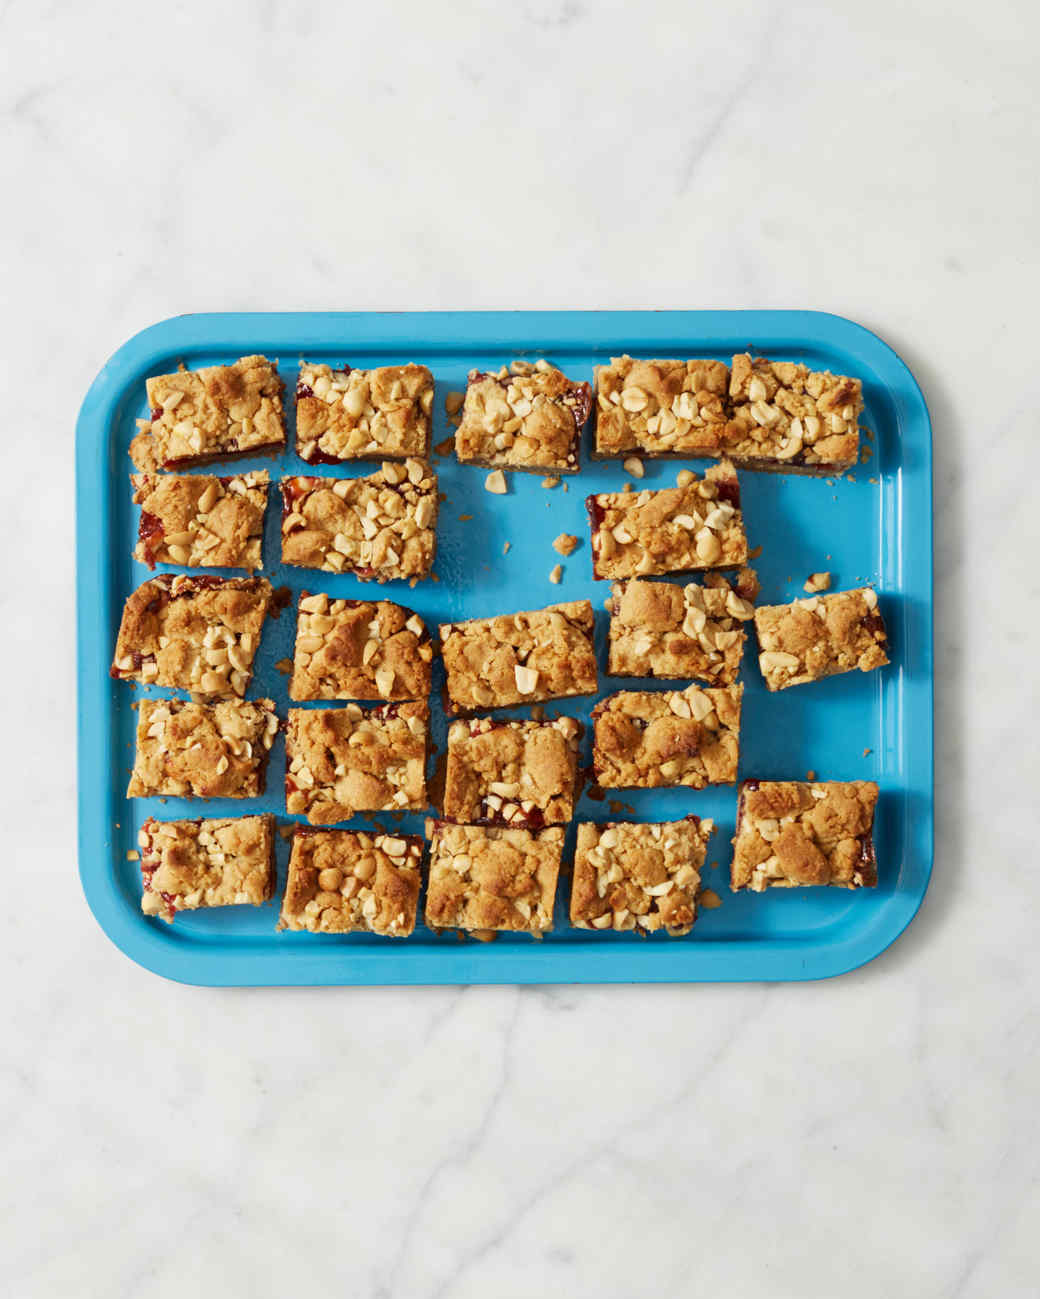 martha-bakes-peanut-butter-jelly-bars-214-d110936-0414.jpg